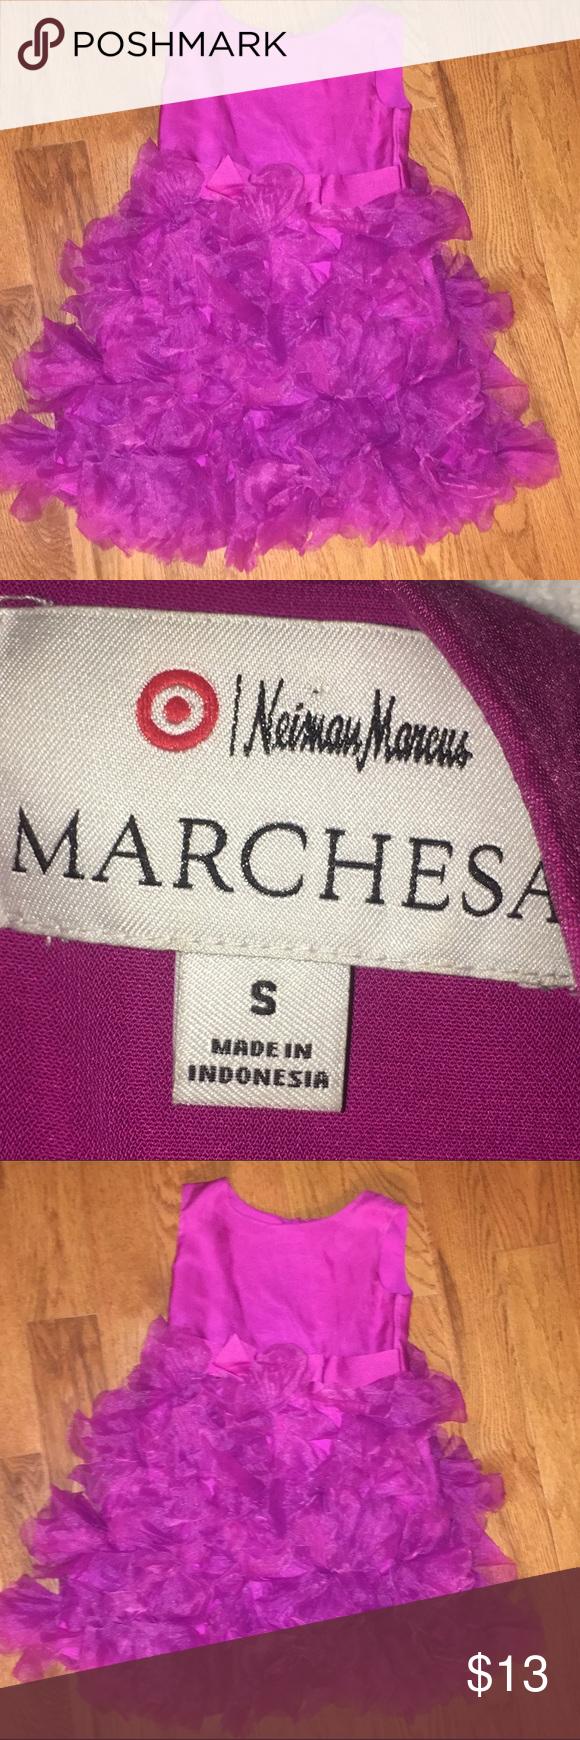 Neiman Marcus SZ S small fancy dress Neiman Marcus Marchesa purple ...